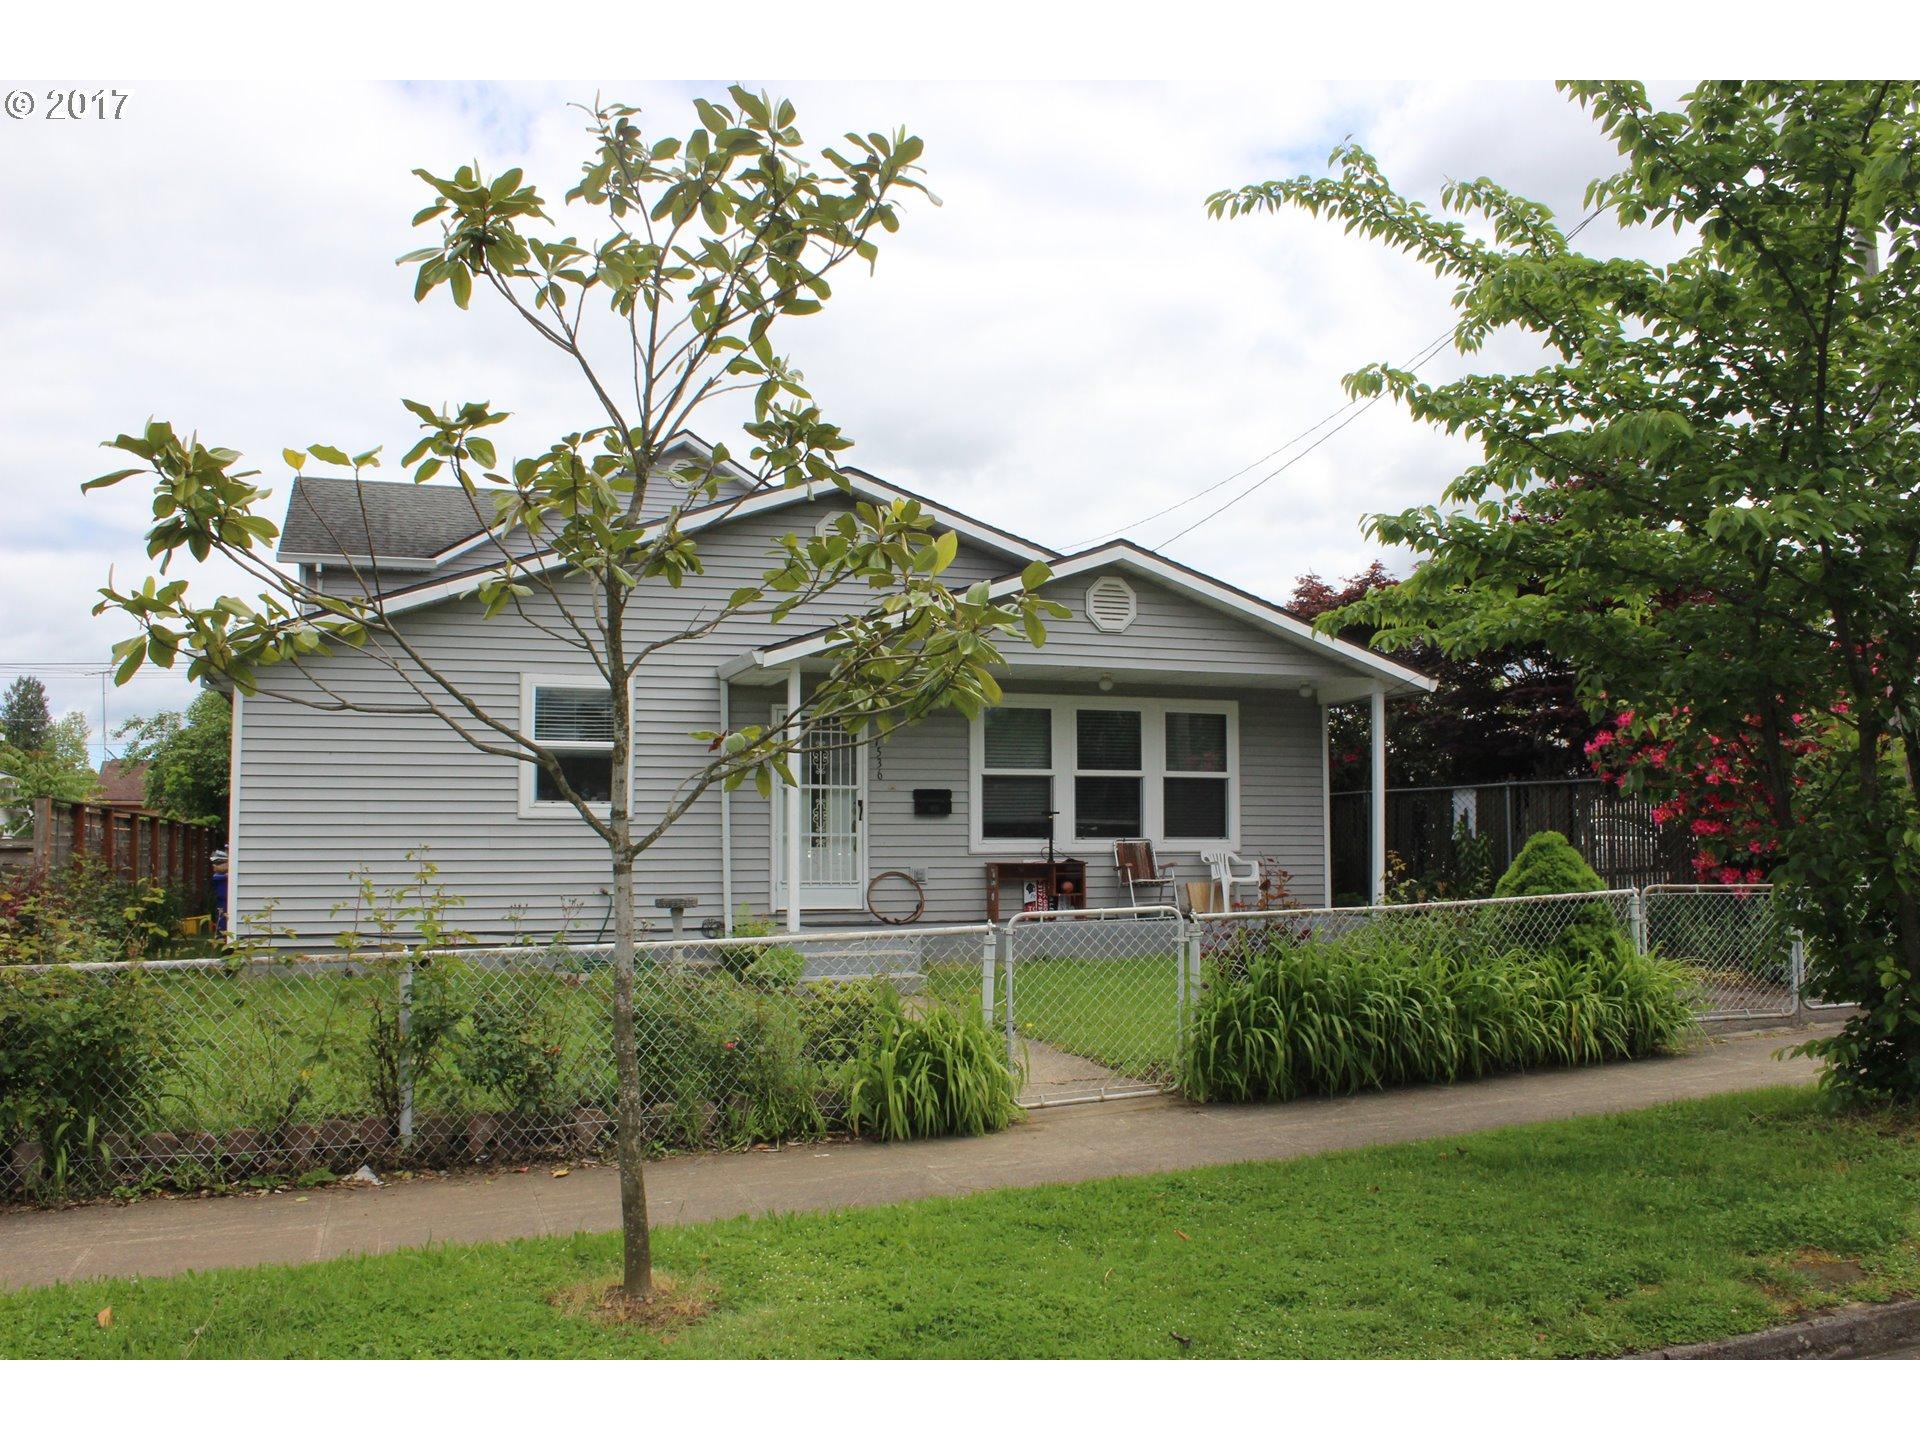 7536 N CHATHAM AVE, Portland, OR 97217